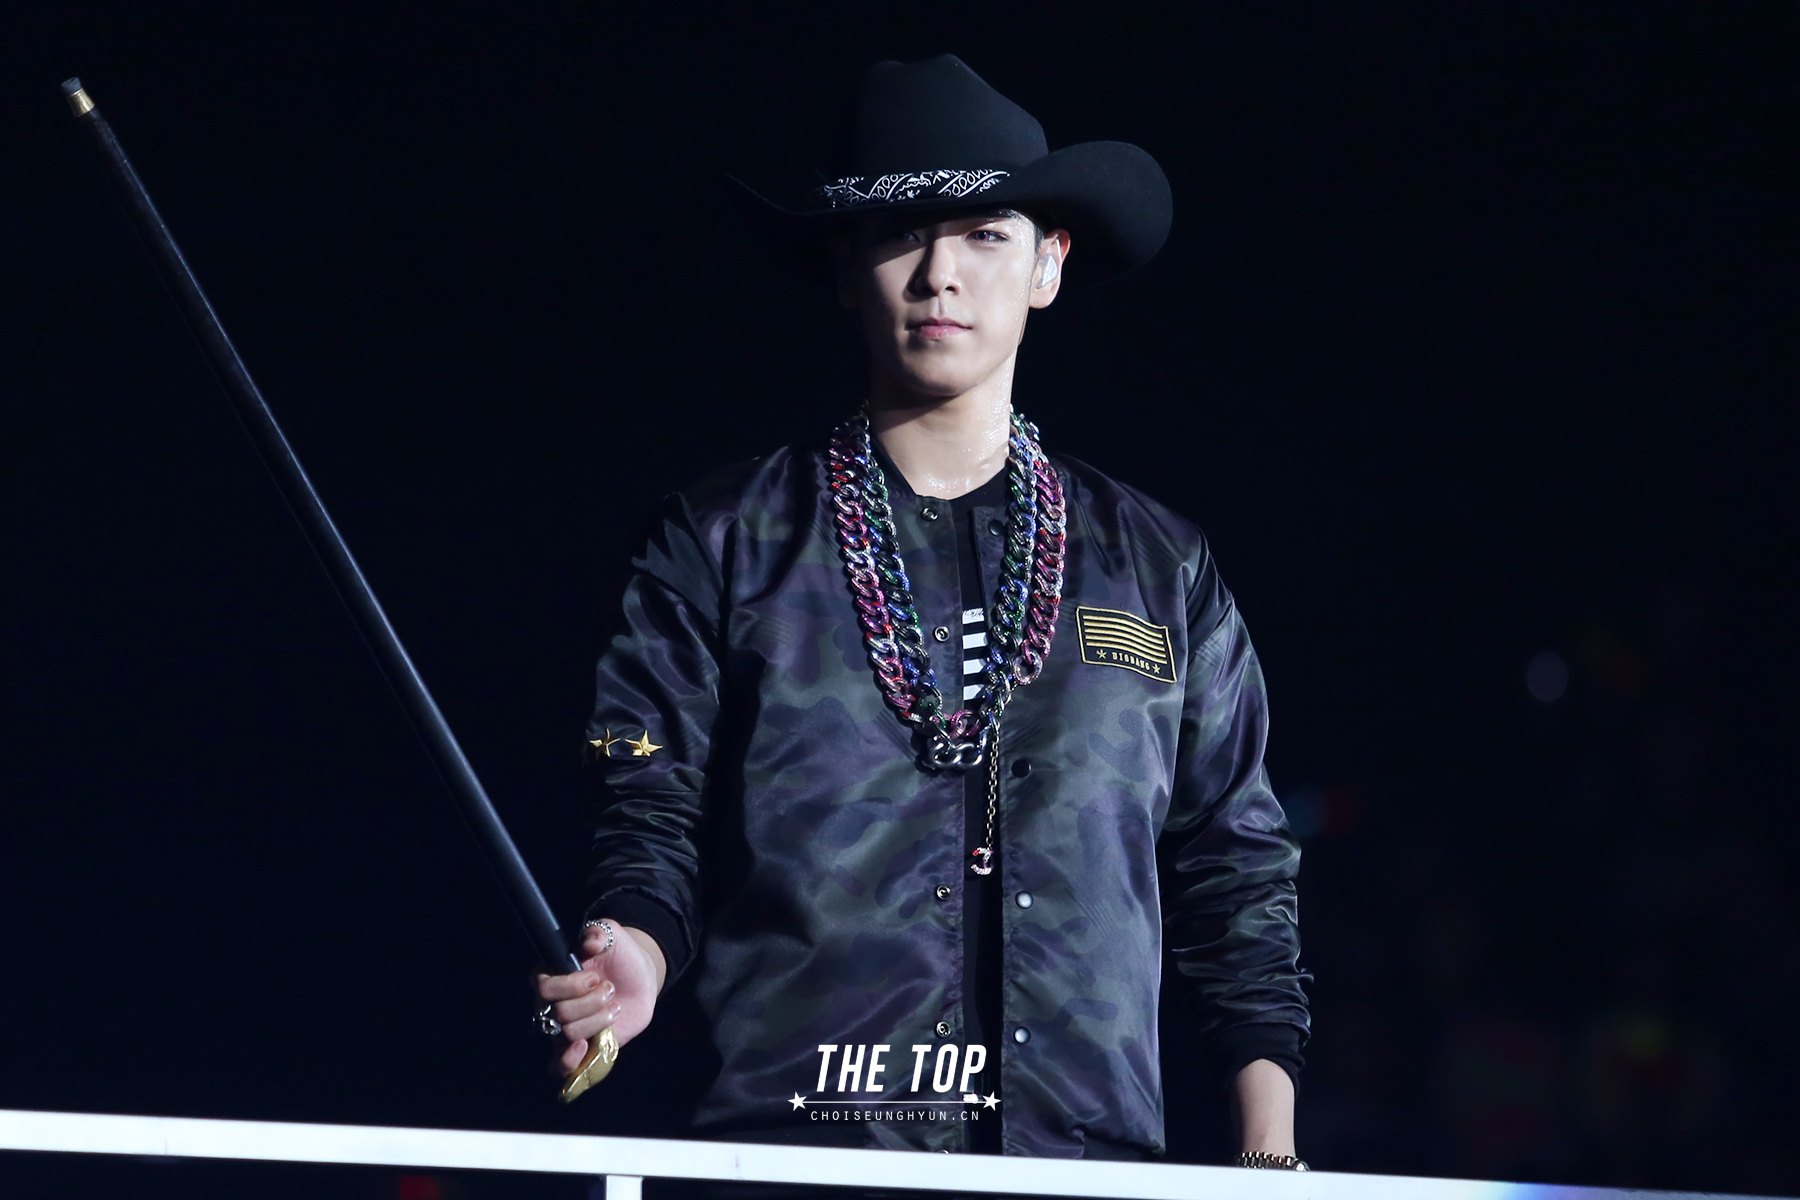 BIGBANG - Made Tour - Tokyo - 13nov2015 - The TOP - 04.jpg